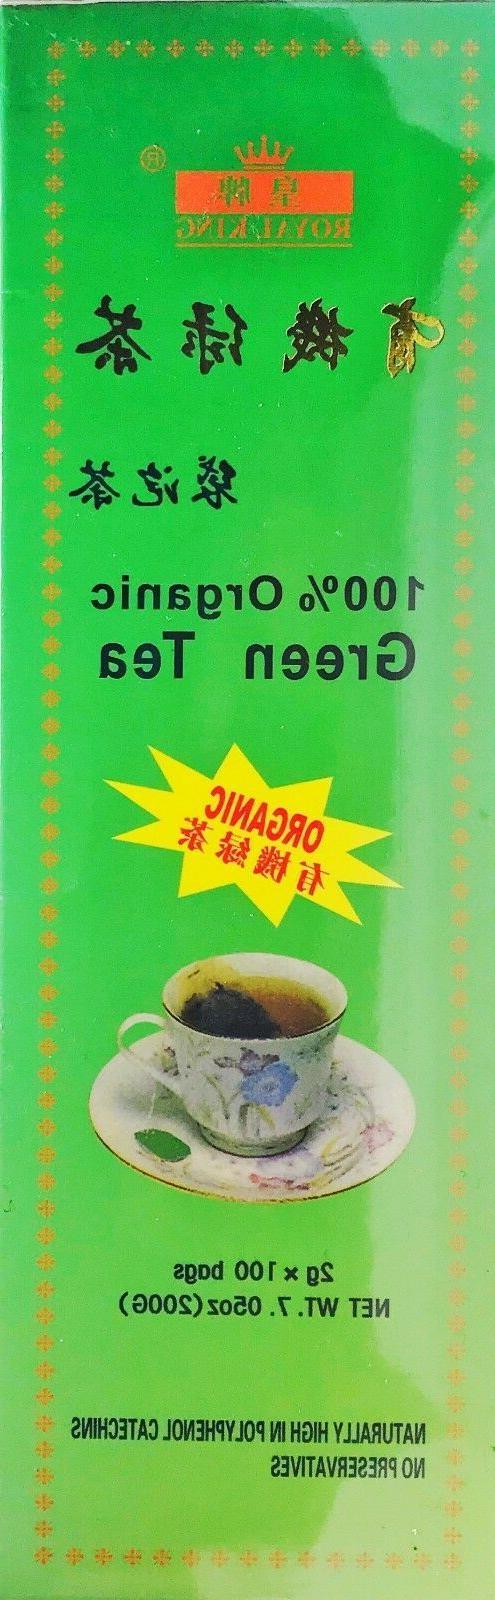 Organic Tea USDA Certified bags.